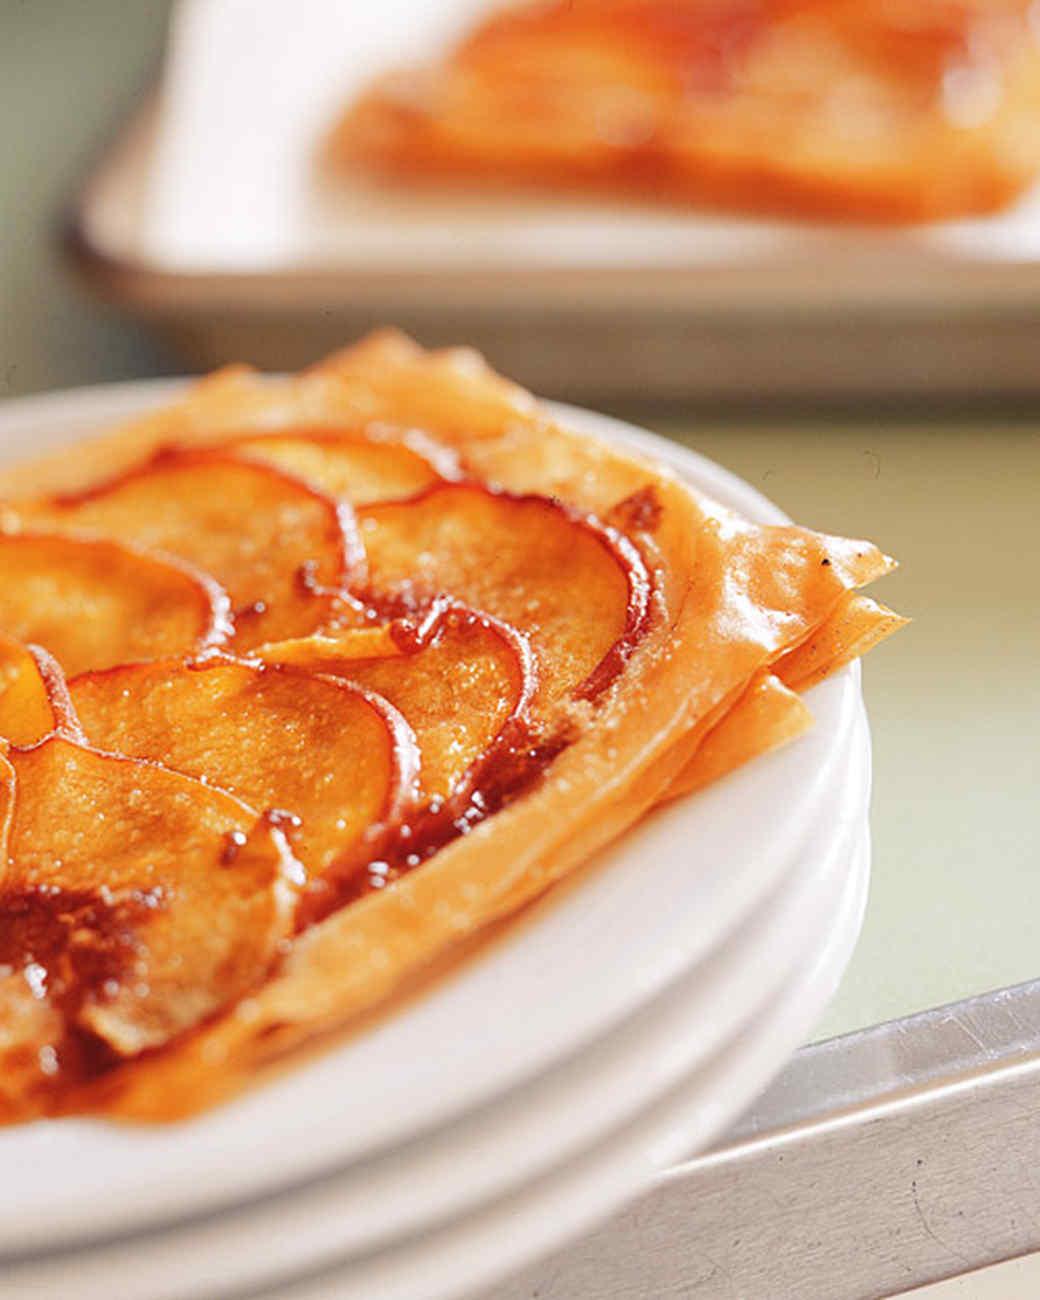 Individual Peach Pastries